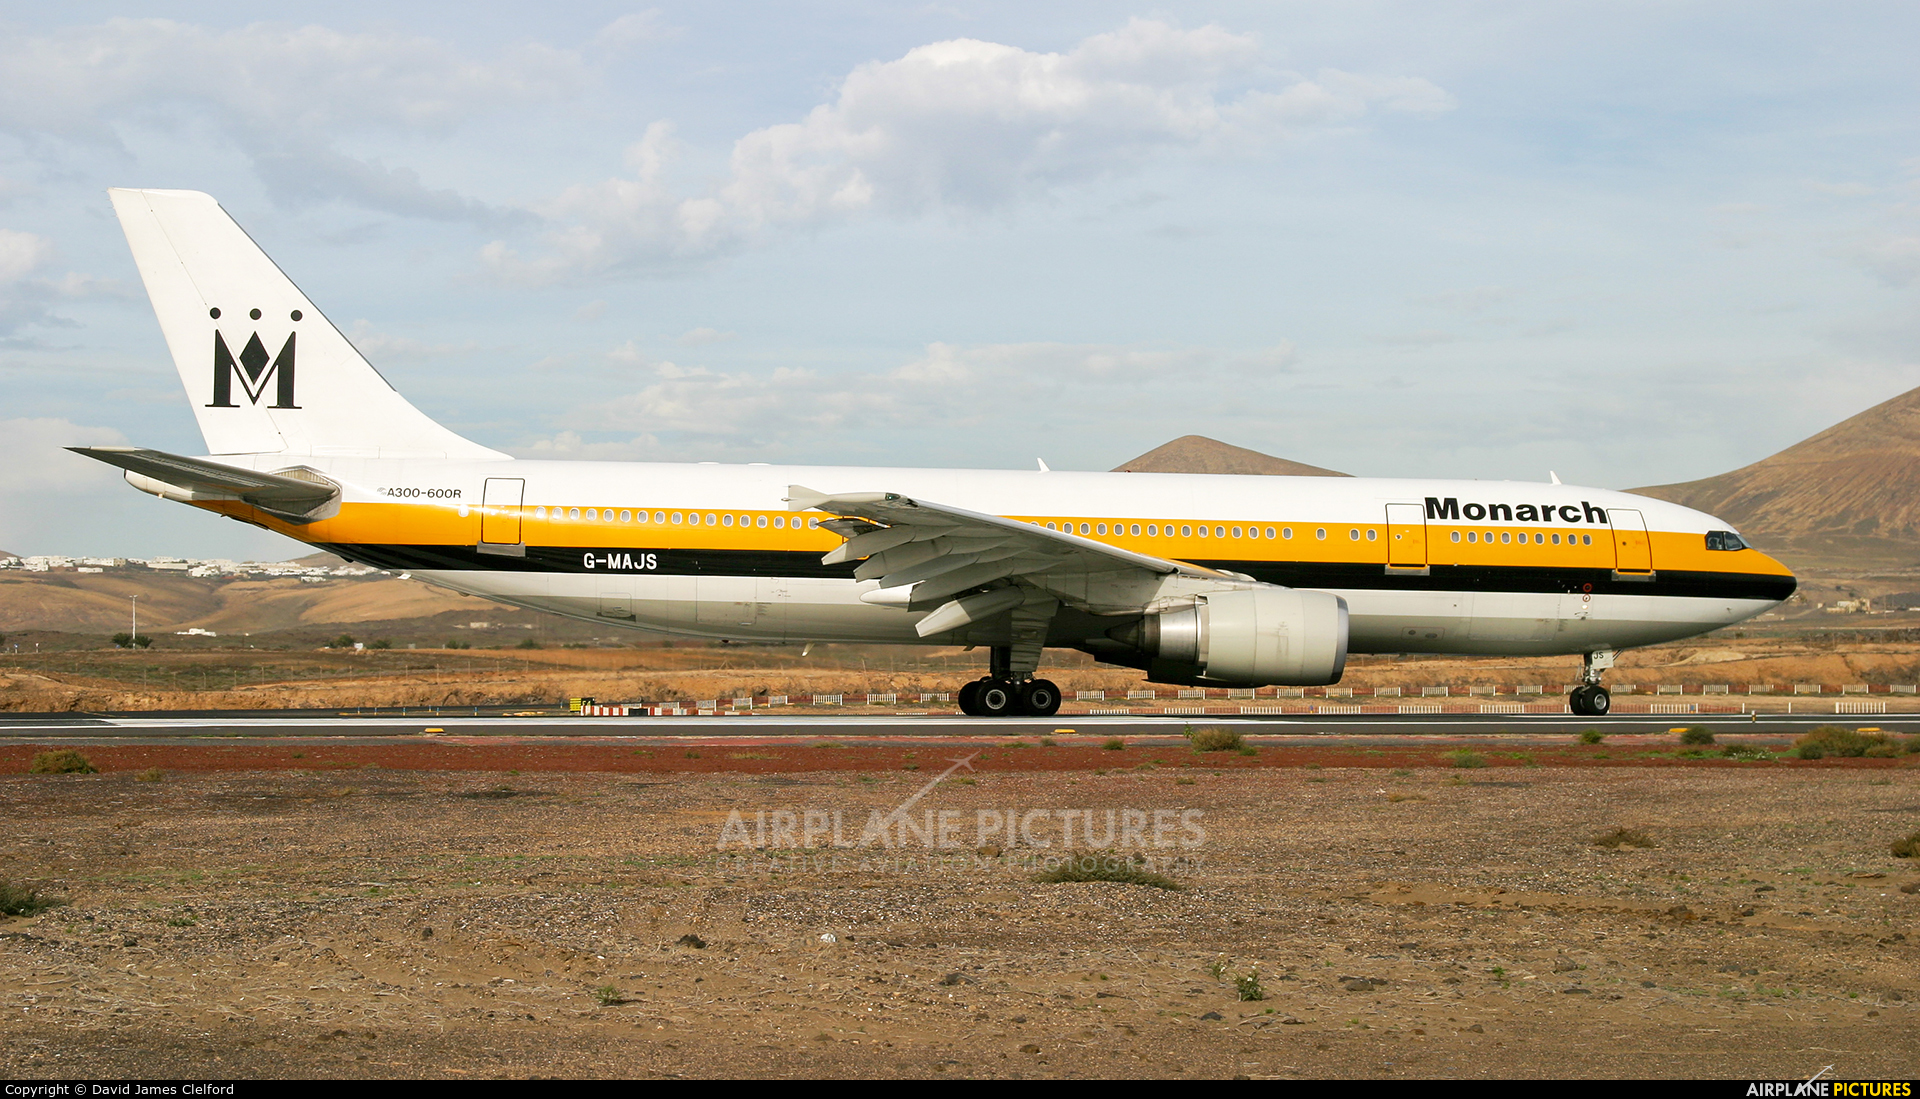 Monarch Airlines G-MAJS aircraft at Lanzarote - Arrecife